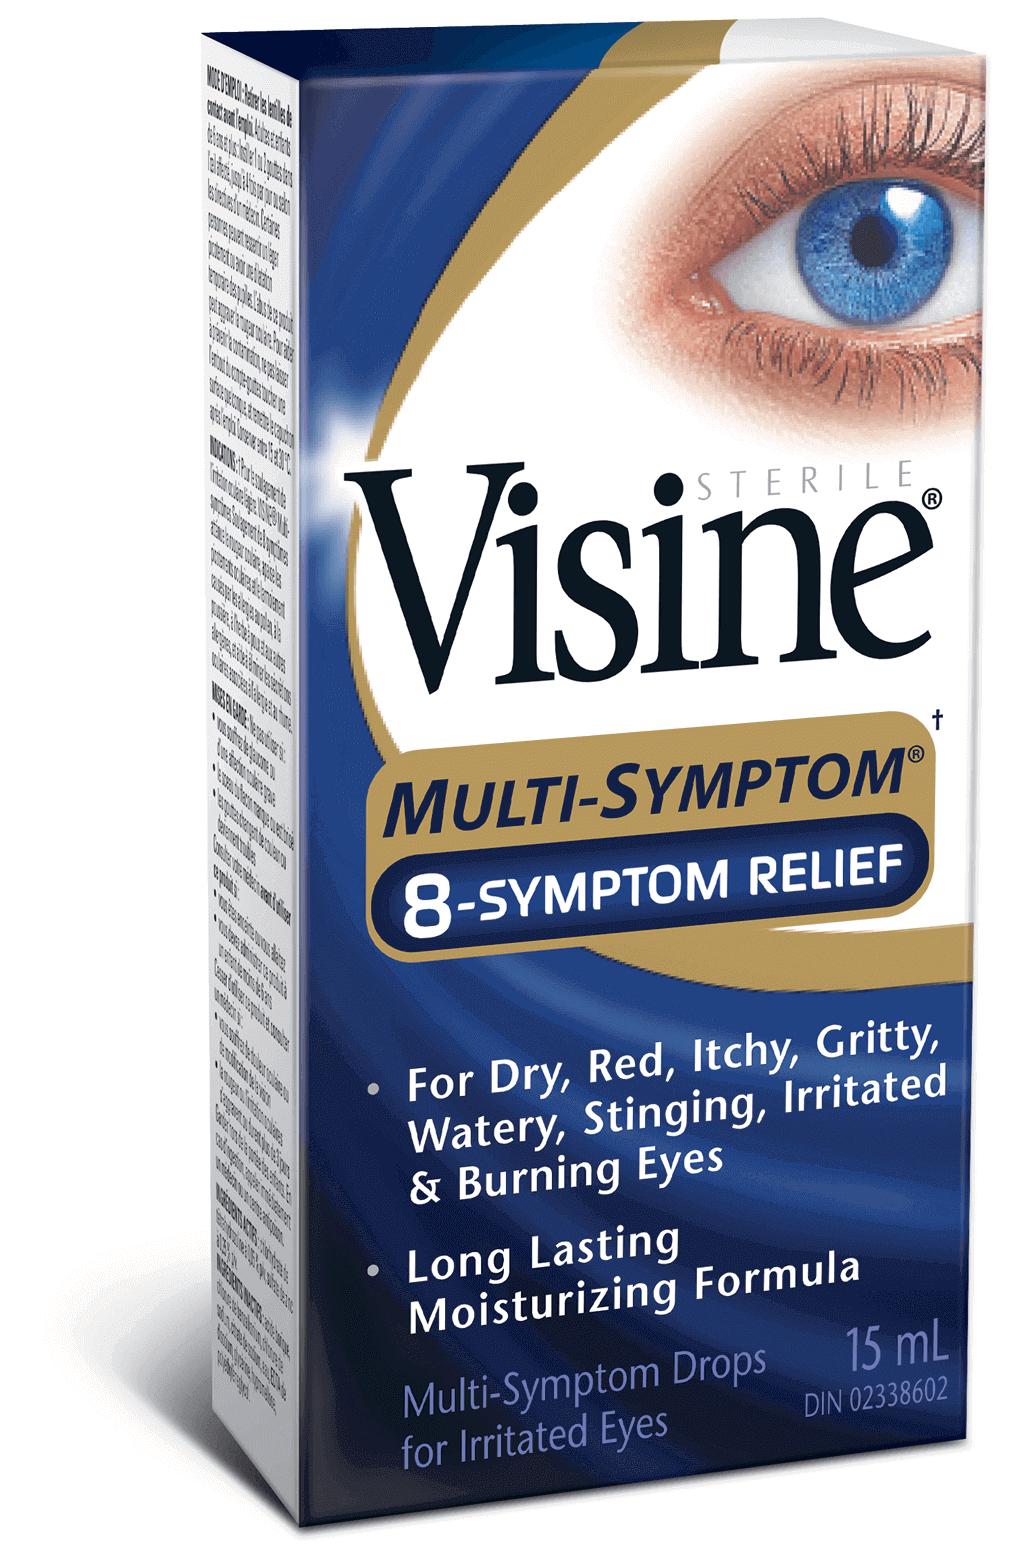 VISINE® Multi-Symptom 8-Symptom Relief